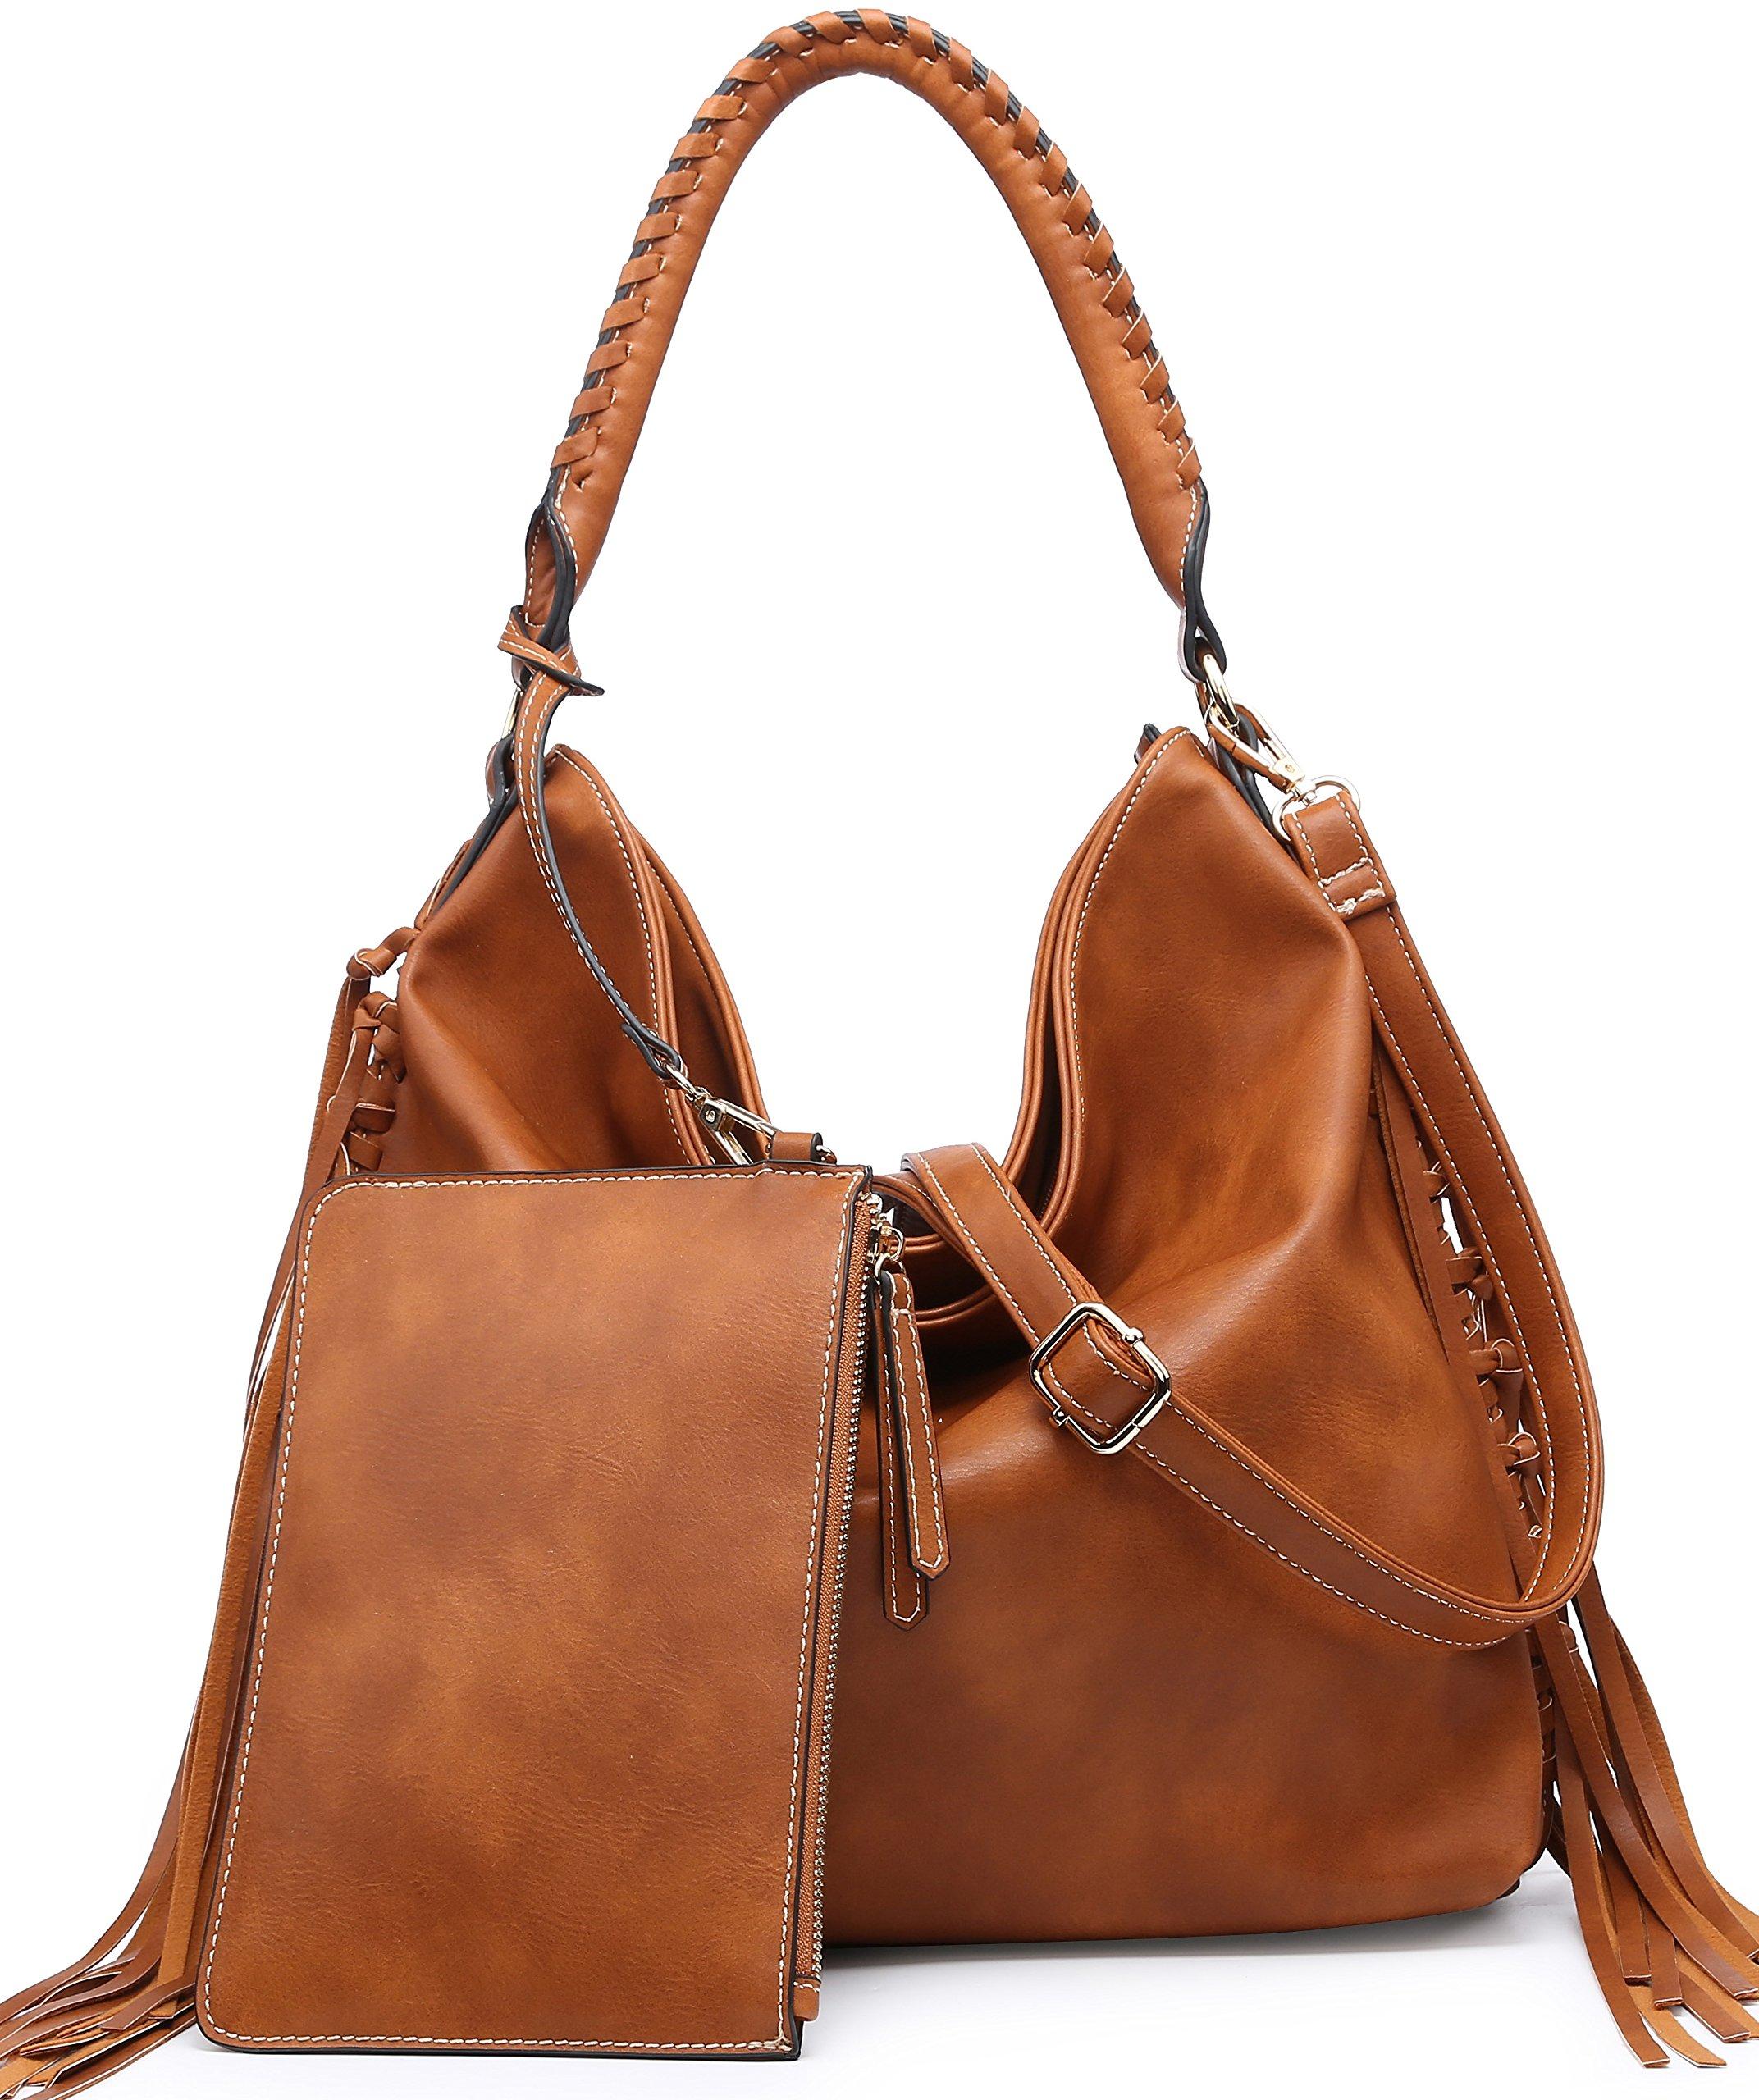 Shomico Womens Shoulder Bag Hobo Purse Crossbody Fringe Handbag for Ladies Spring Summer Brown (Large, Daisy Tan)